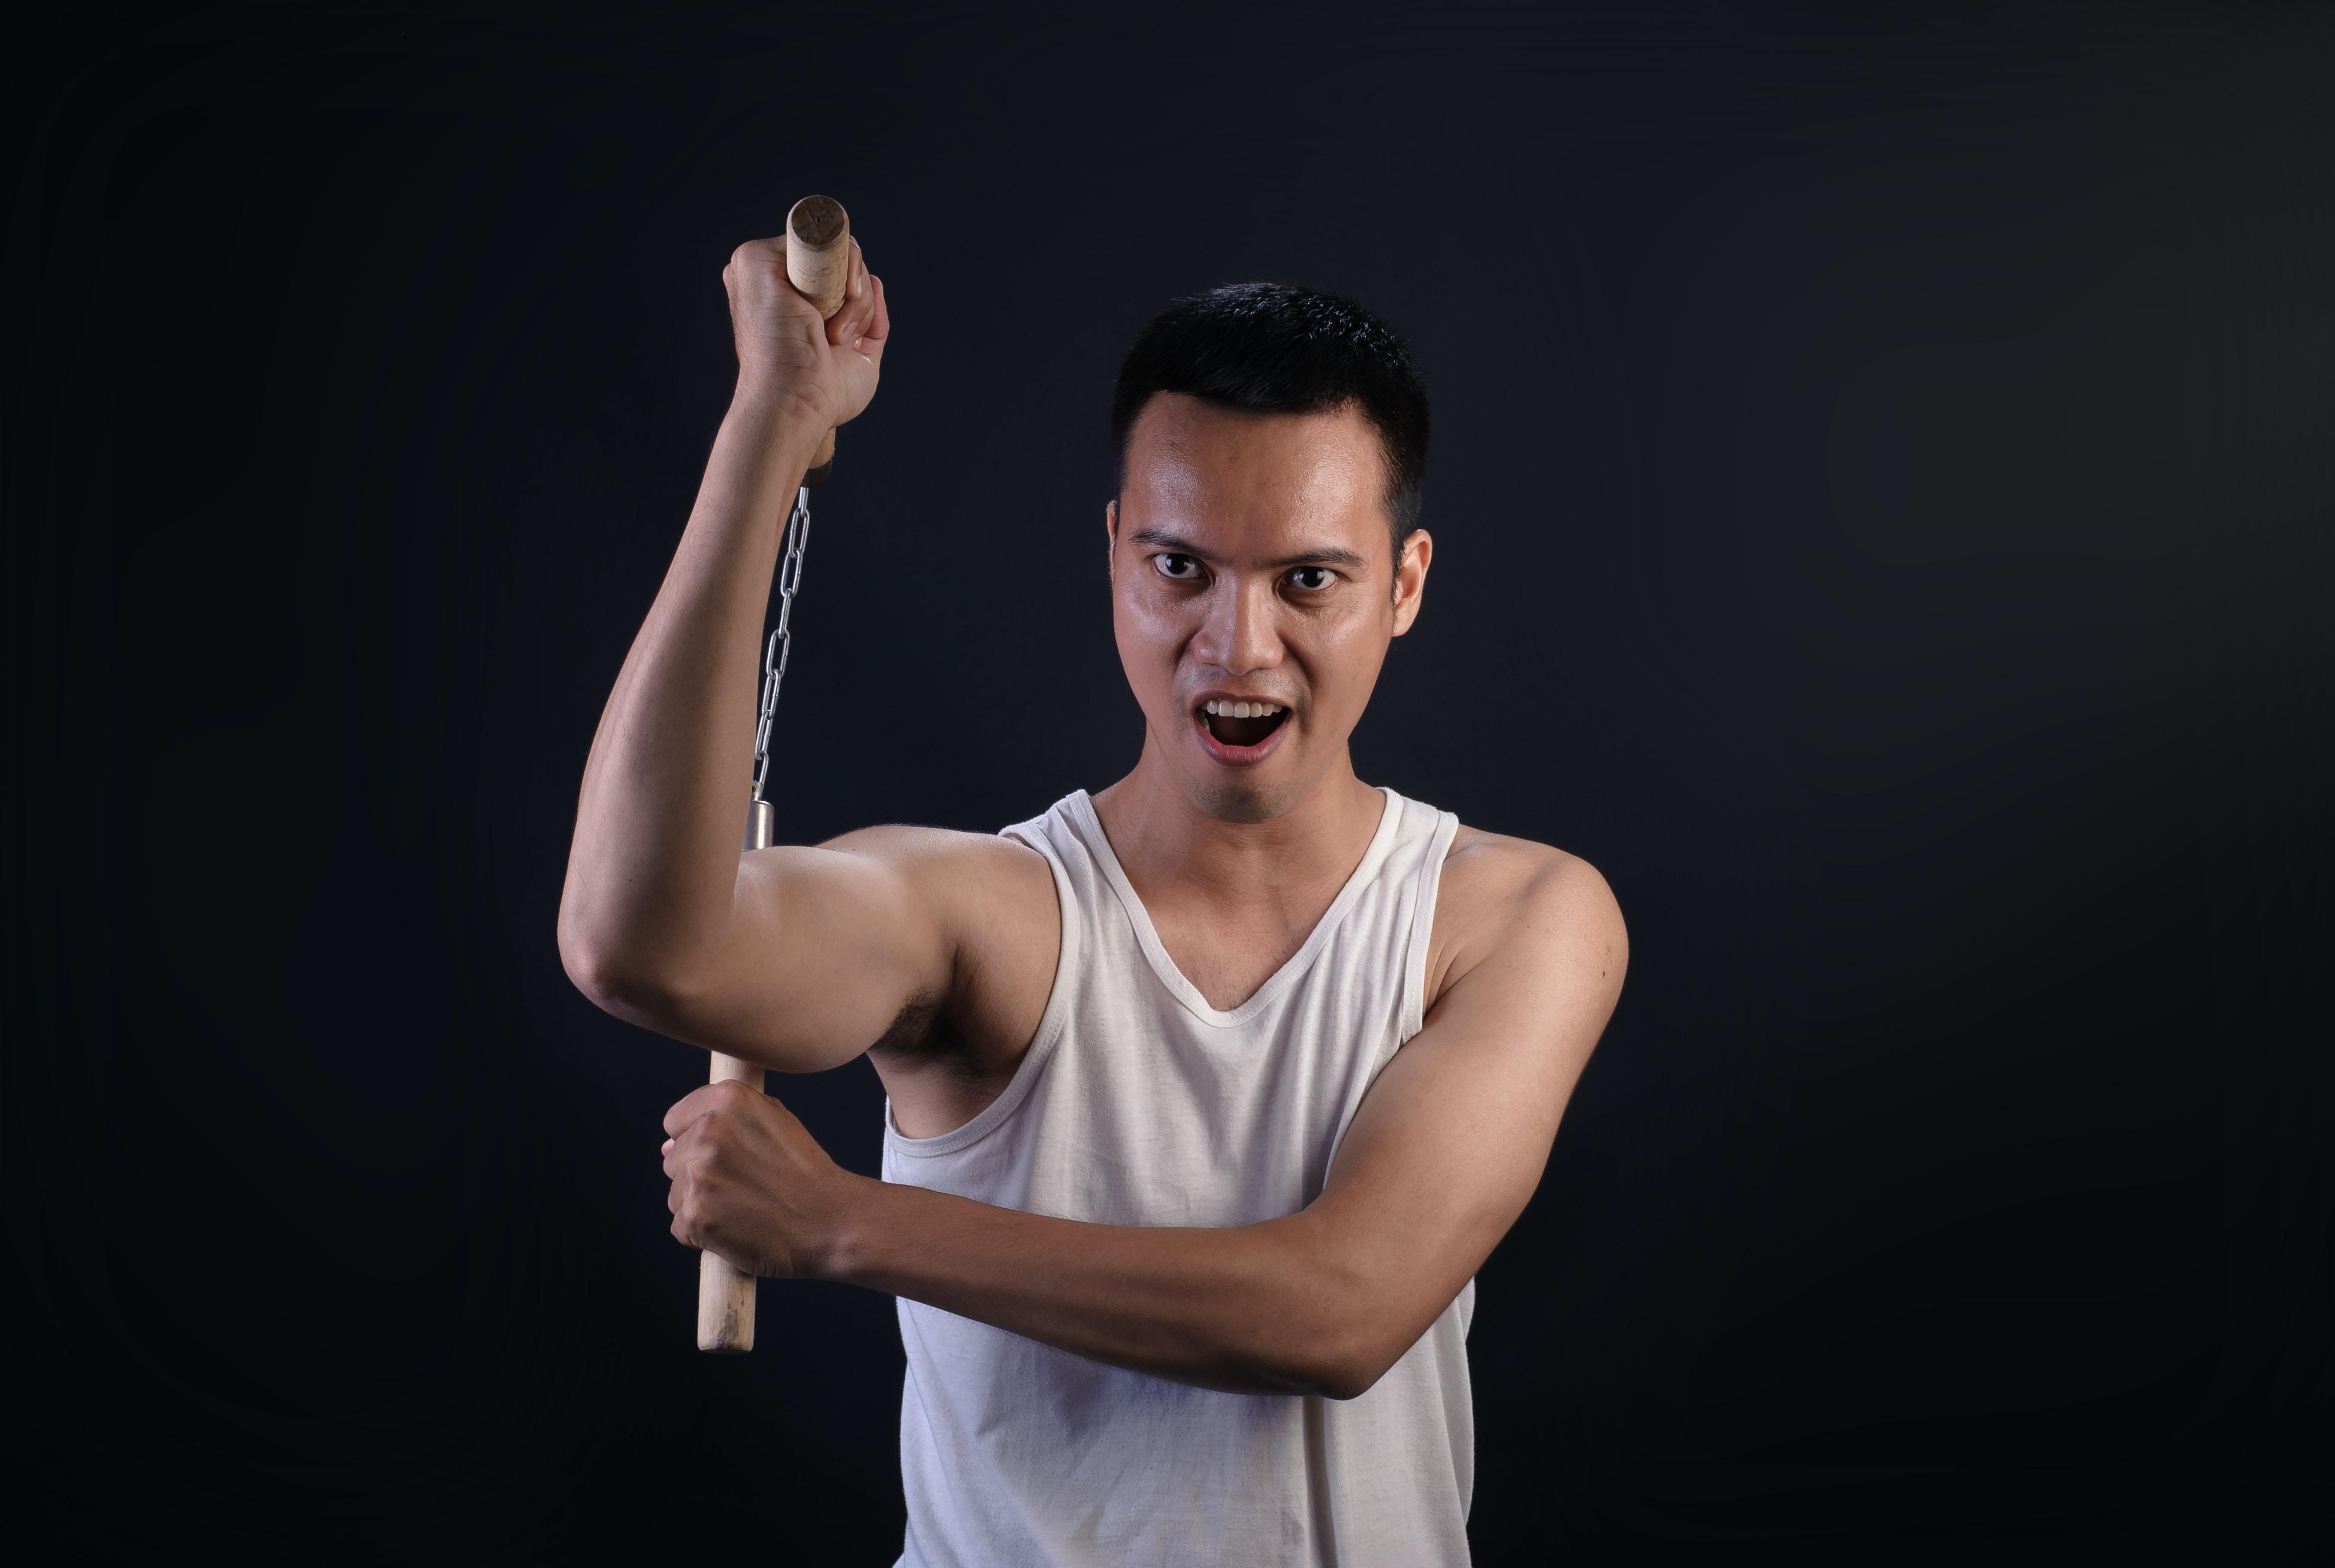 man holding brown nunchaku